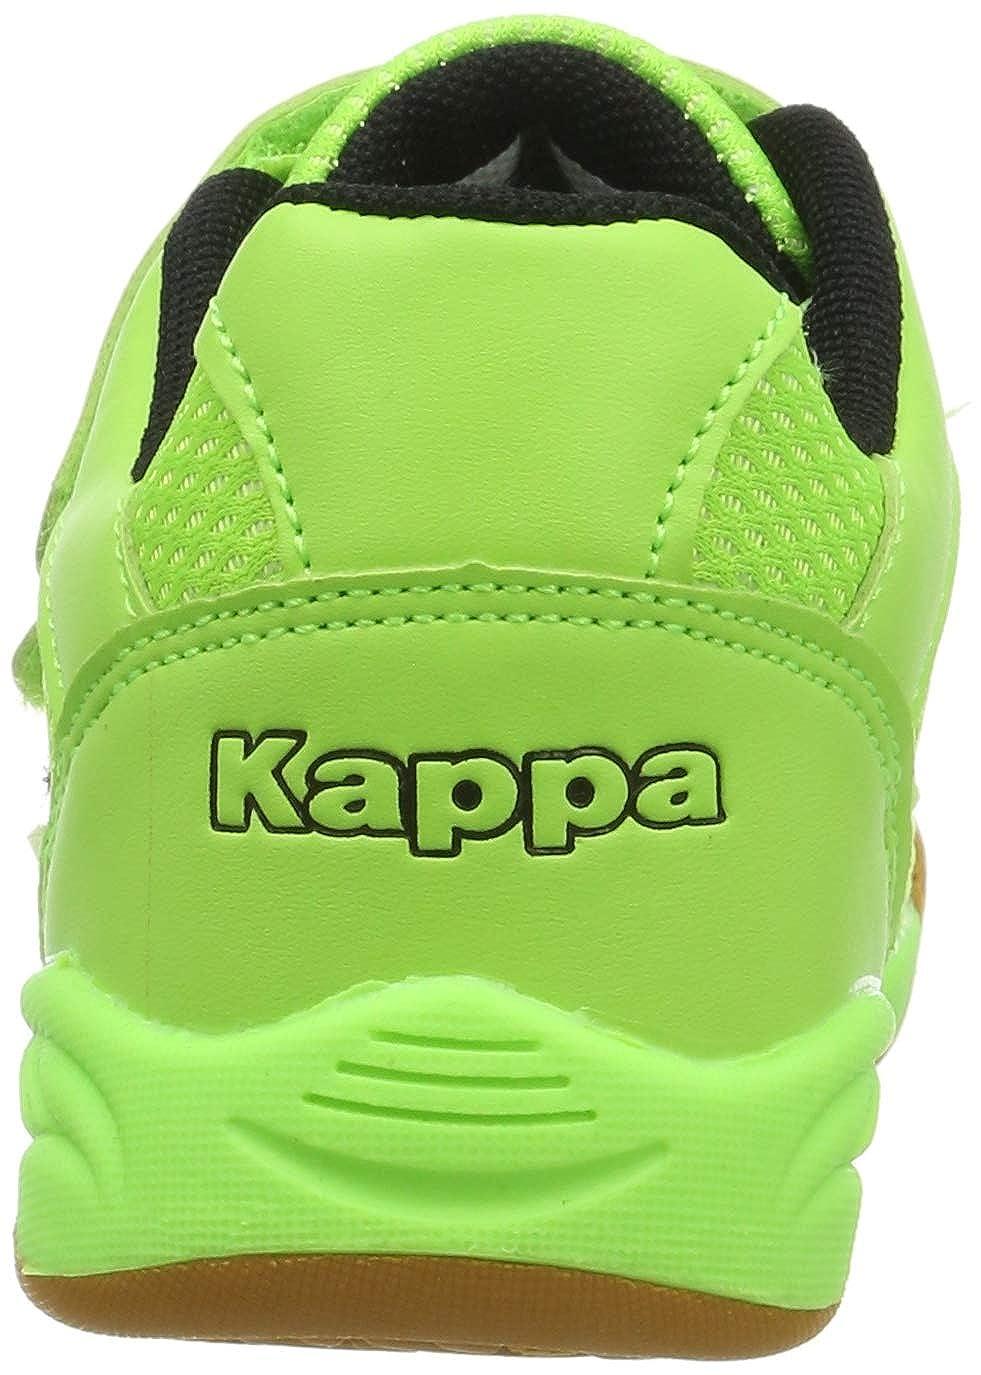 Kappa Kickoff OC Kids Scarpe da Ginnastica Basse Unisex Bambini